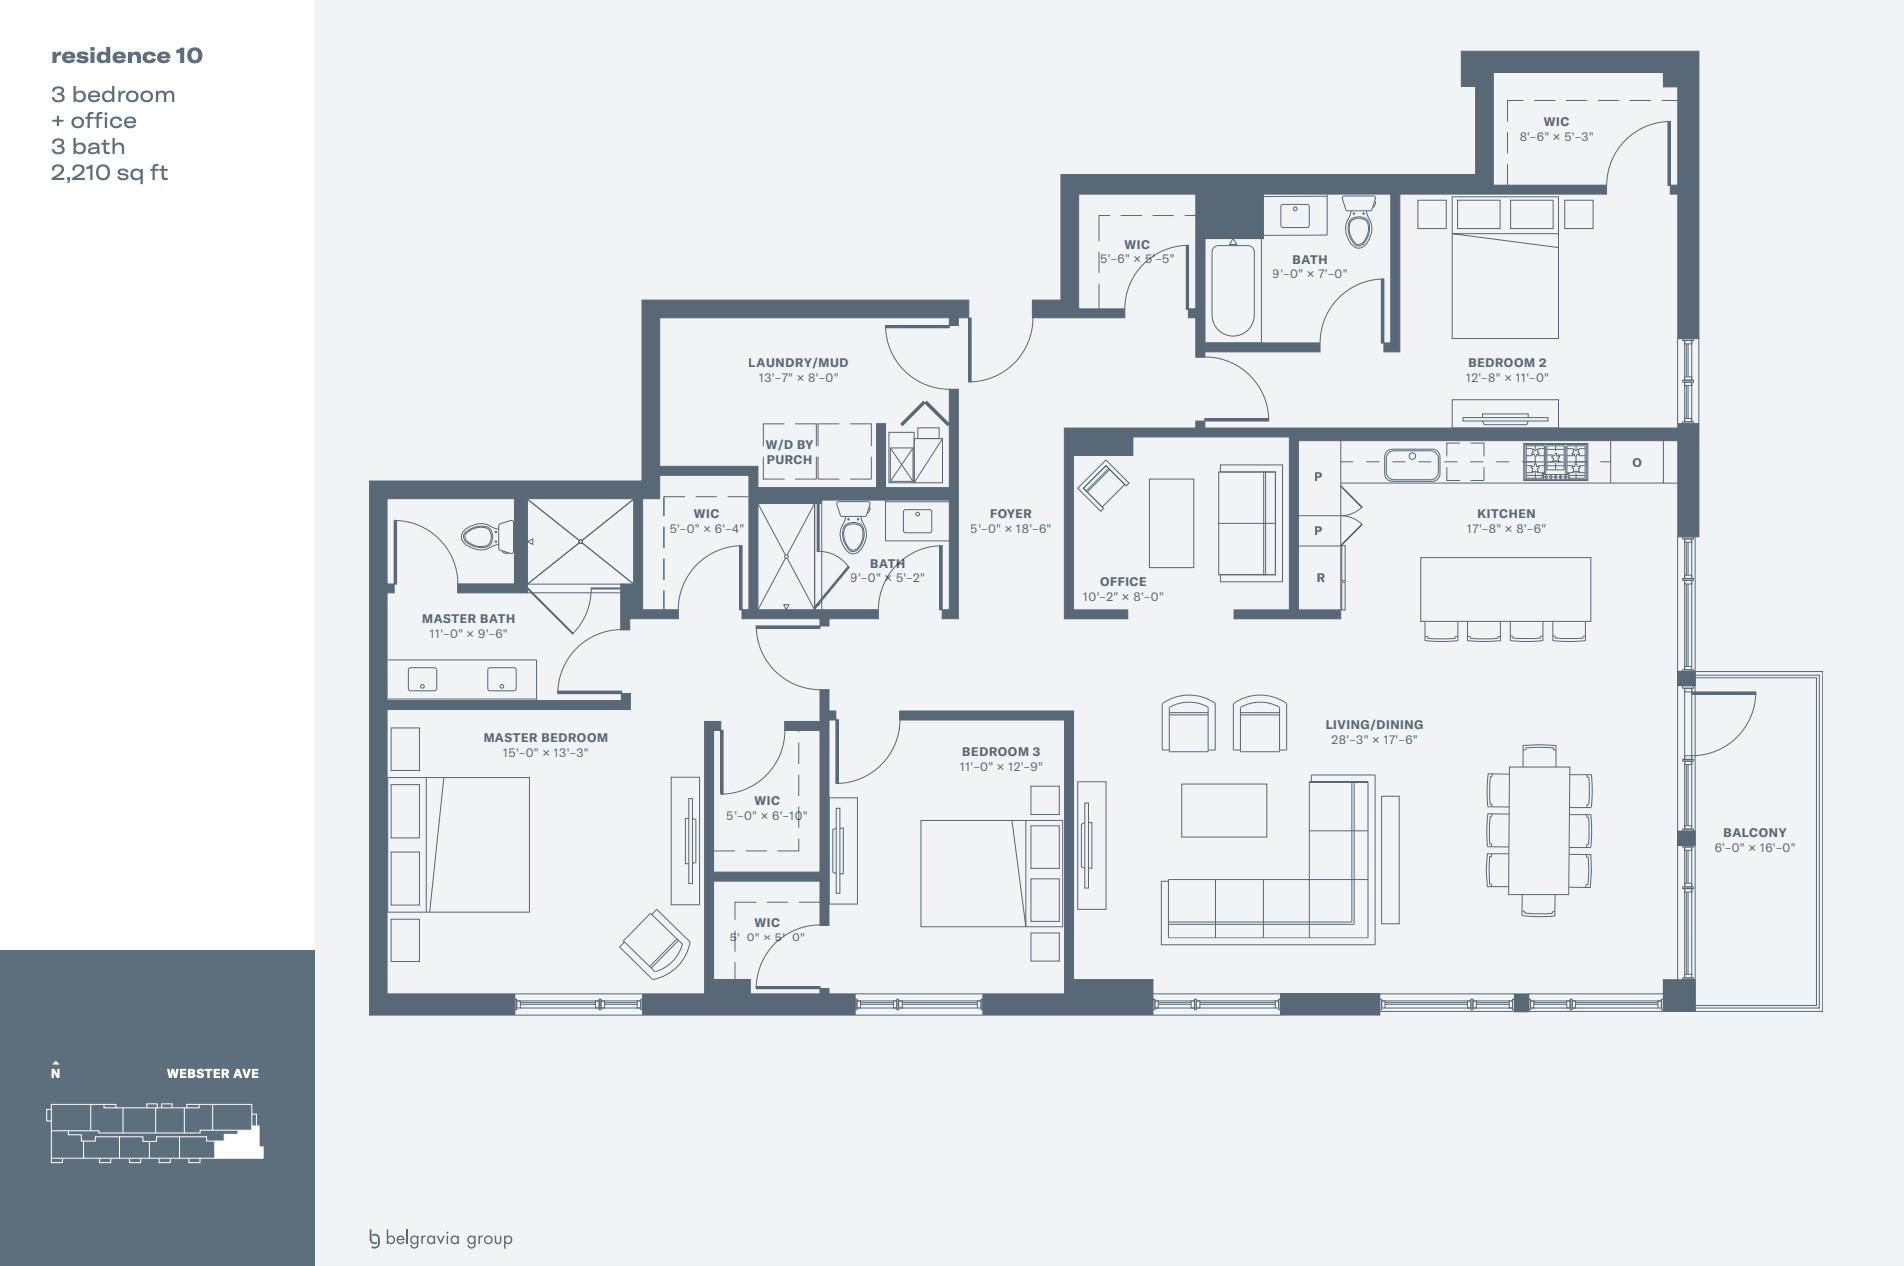 Triangle Square Condos sample three-bedroom + office unit